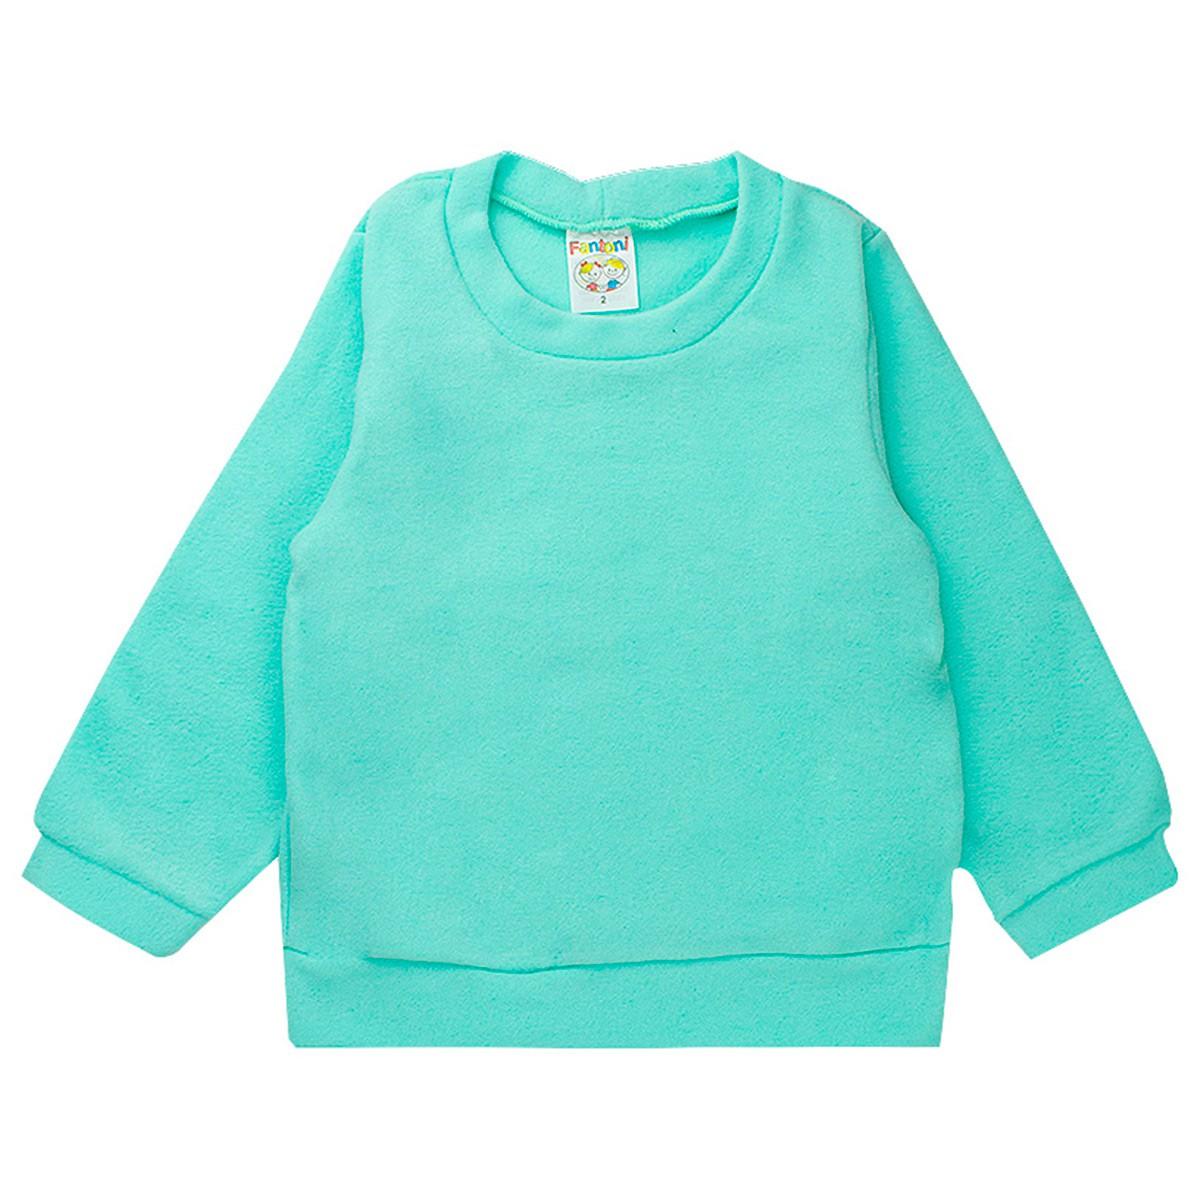 Conjunto Infantil Menino Soft Verde - Fantoni